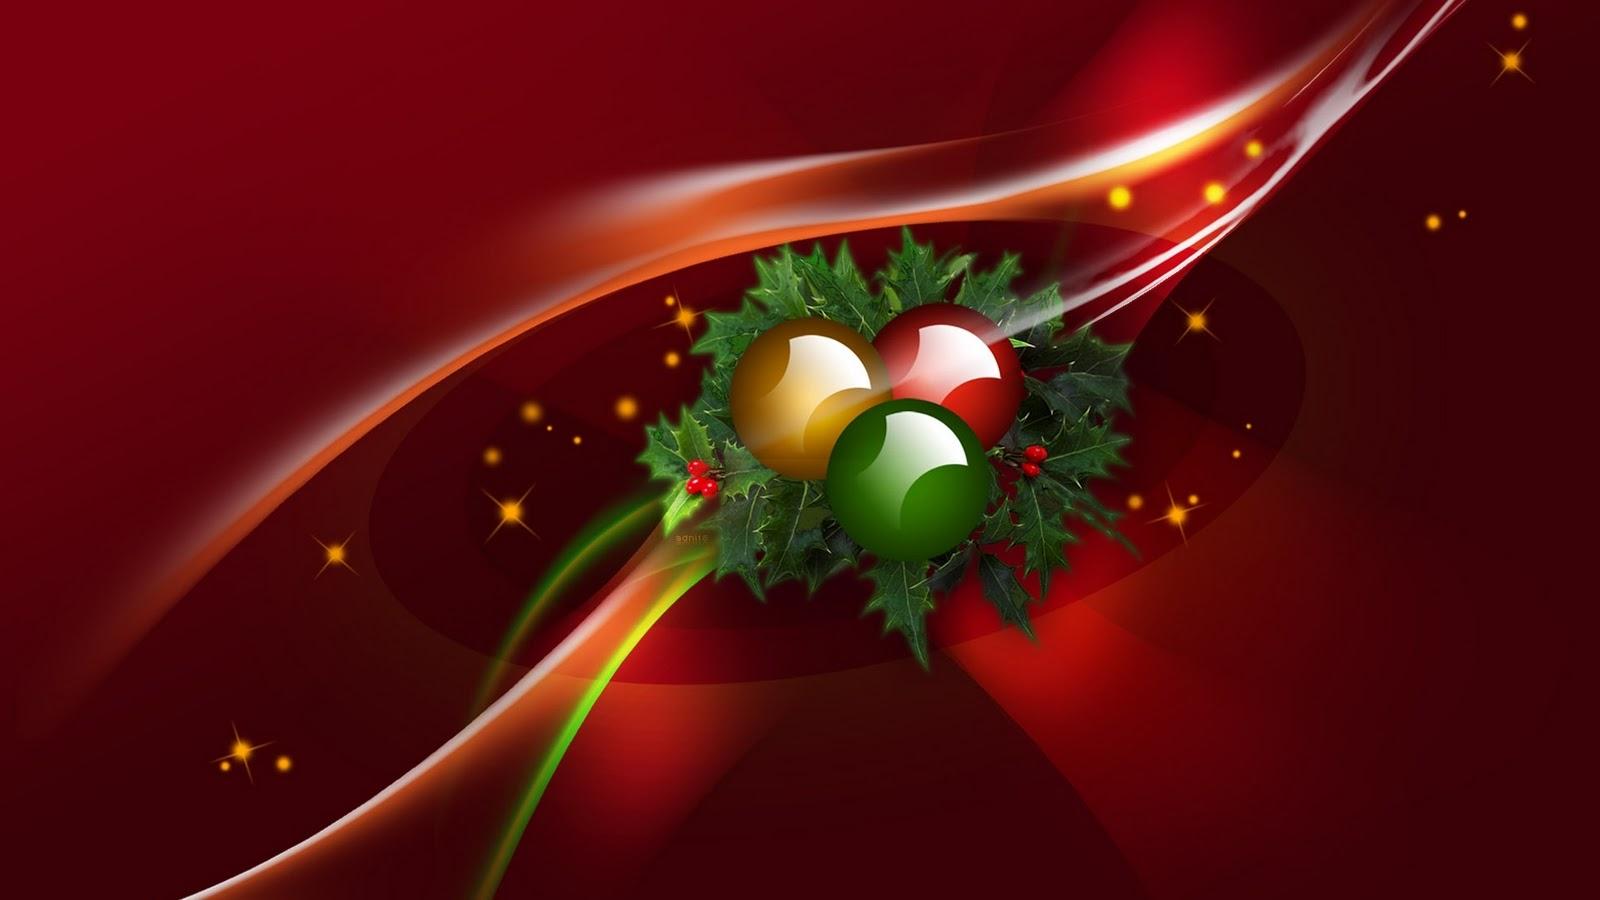 ... Wallpapers: Merry Christmas Desktop Wallpapers Free Merry Christmas